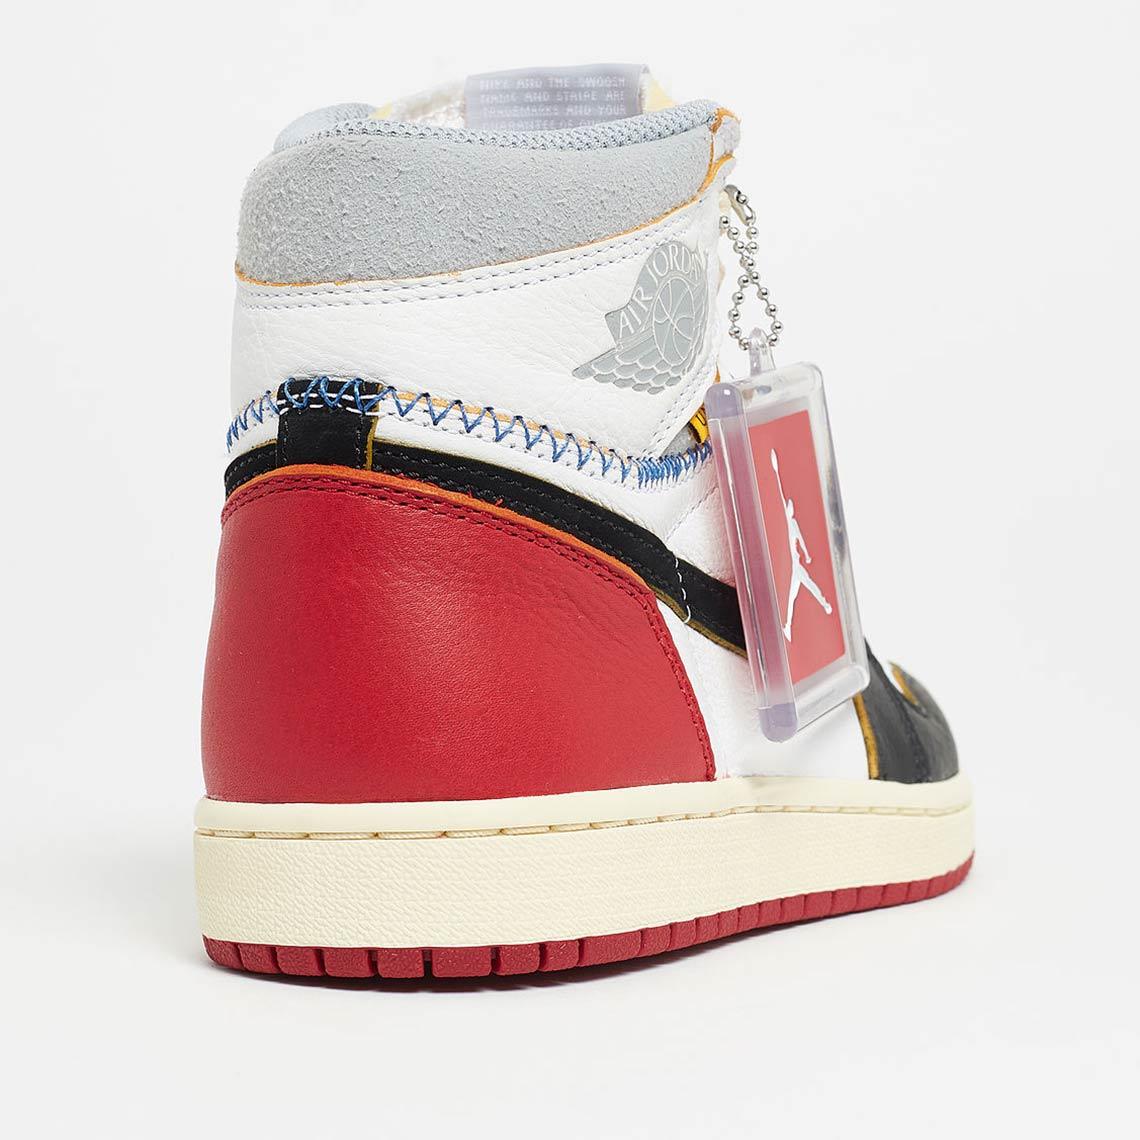 d25b9b76e9e Jordan 1 Union GS BV1300-106 Release Date | SneakerNews.com